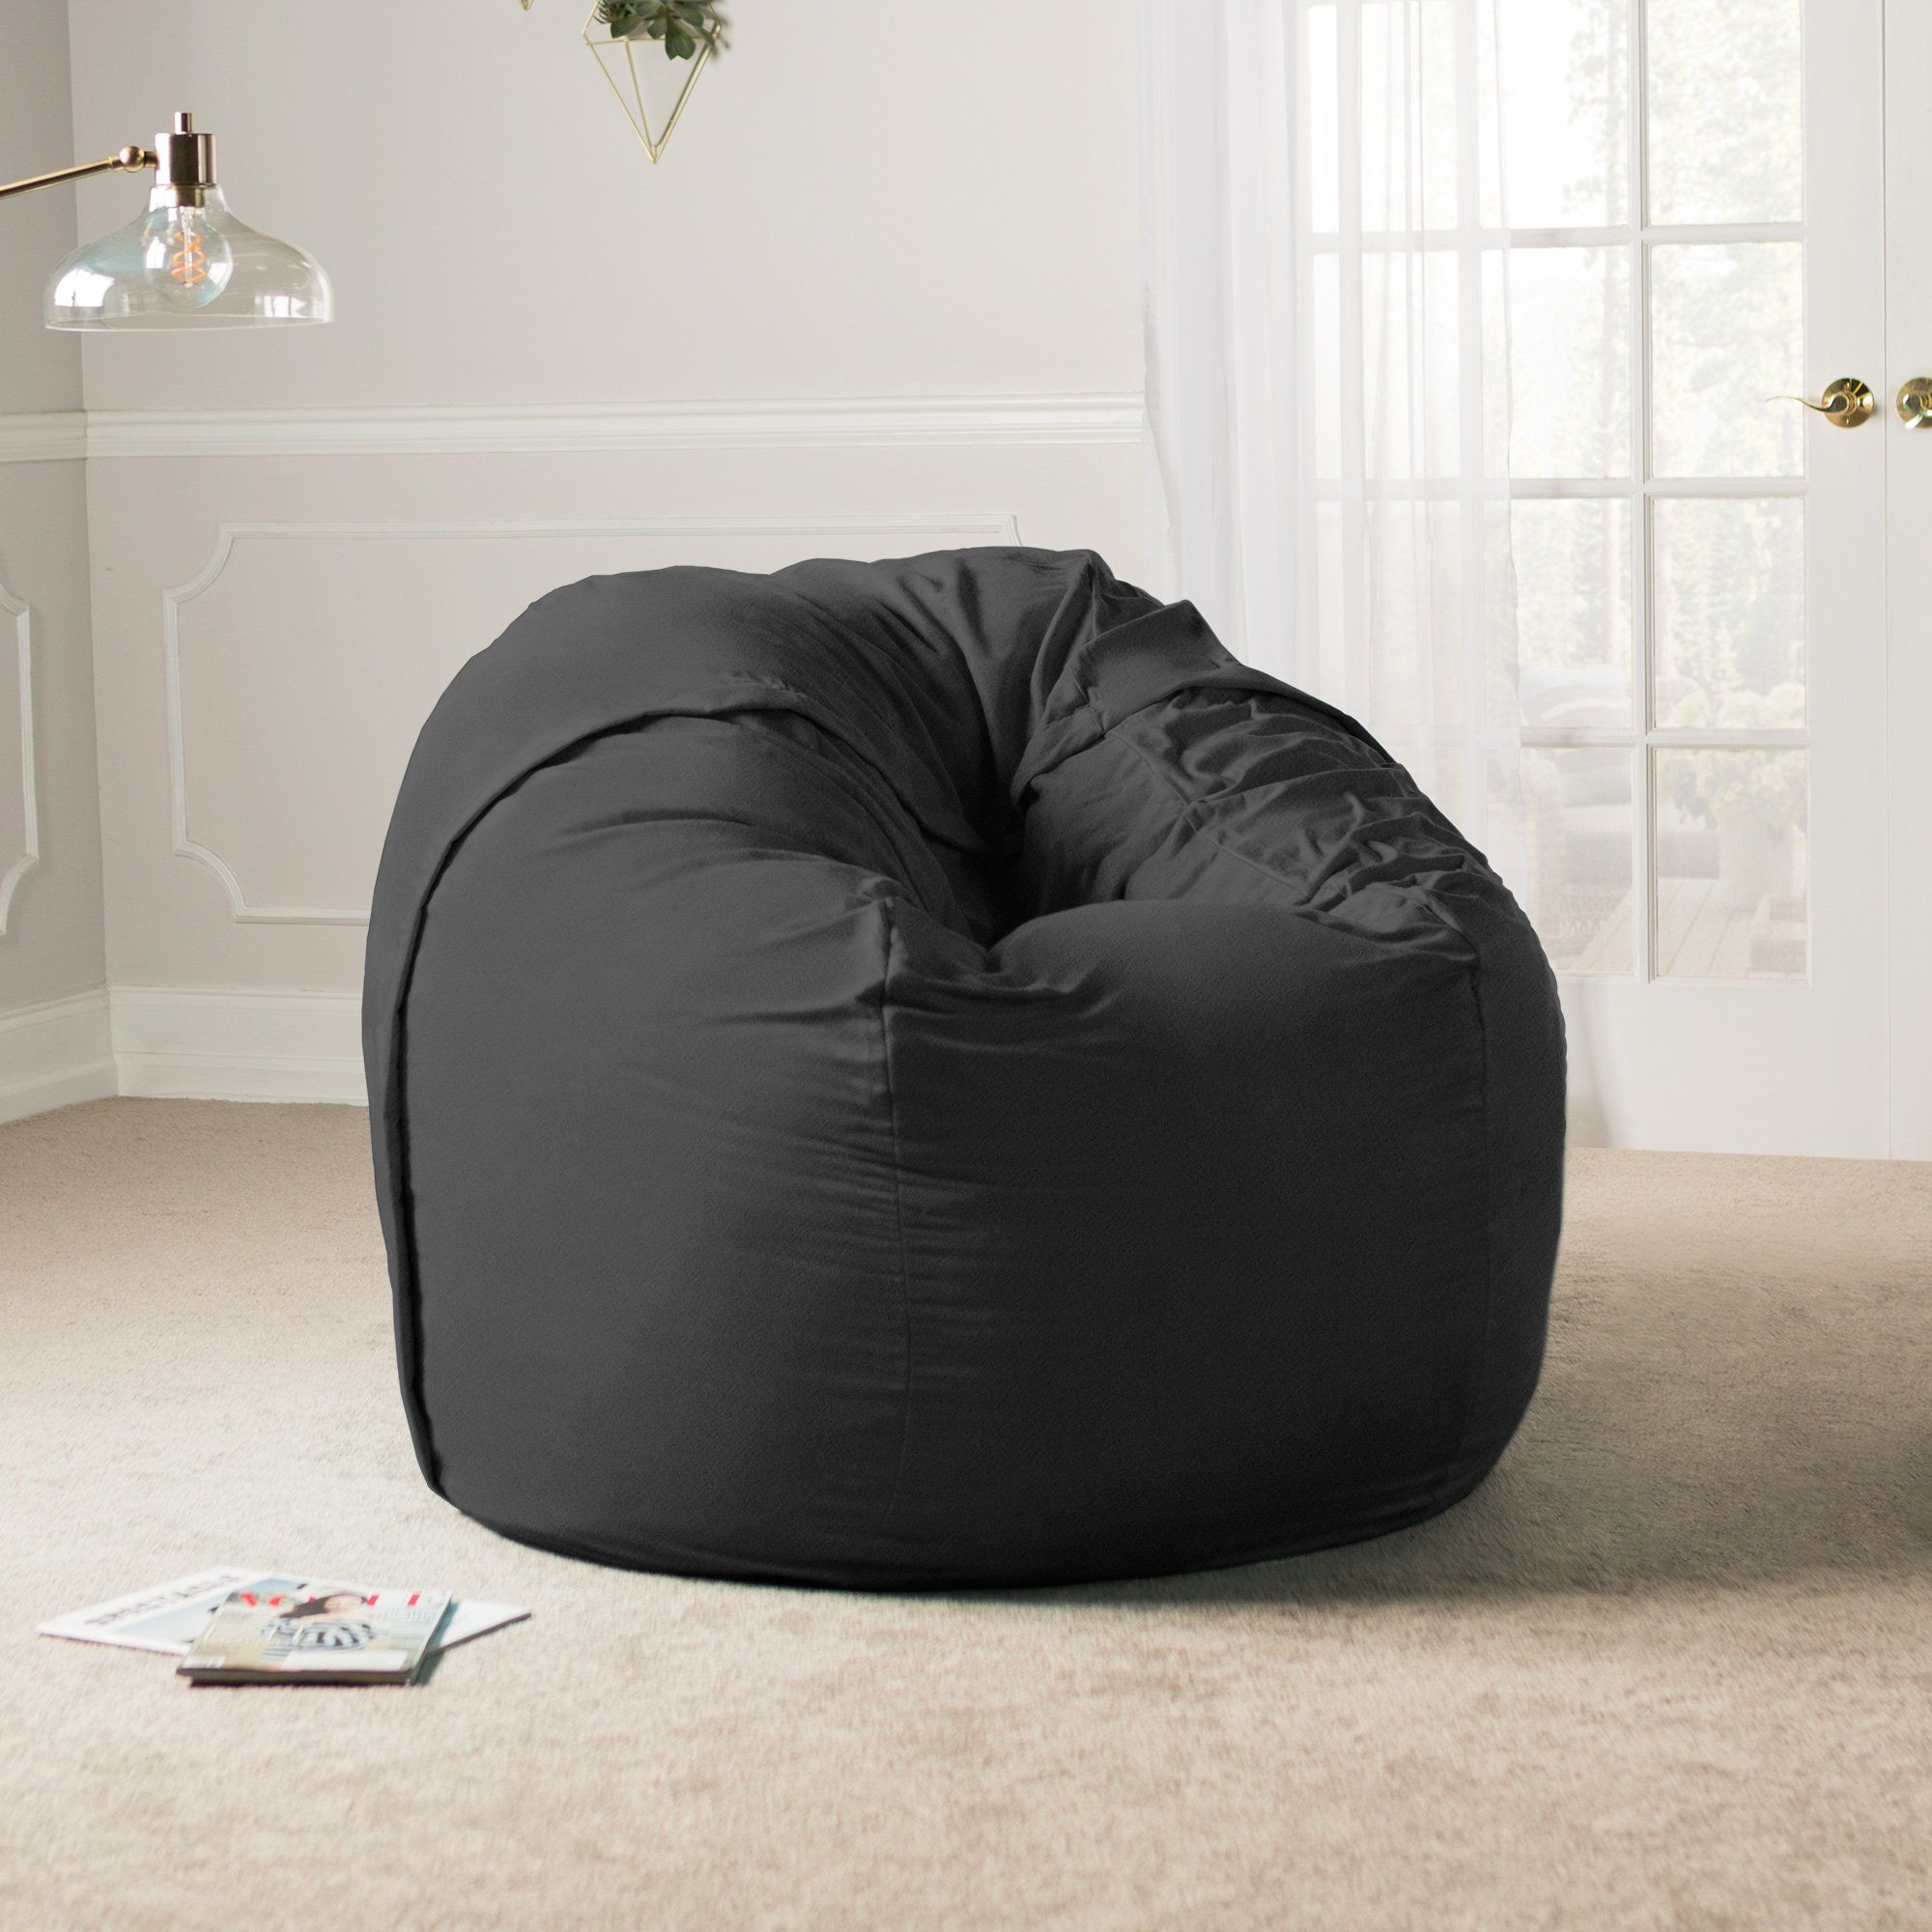 Fantastic Jaxx 5 Foot Saxx Big Bean Bag Chair For Adults Black Andrewgaddart Wooden Chair Designs For Living Room Andrewgaddartcom